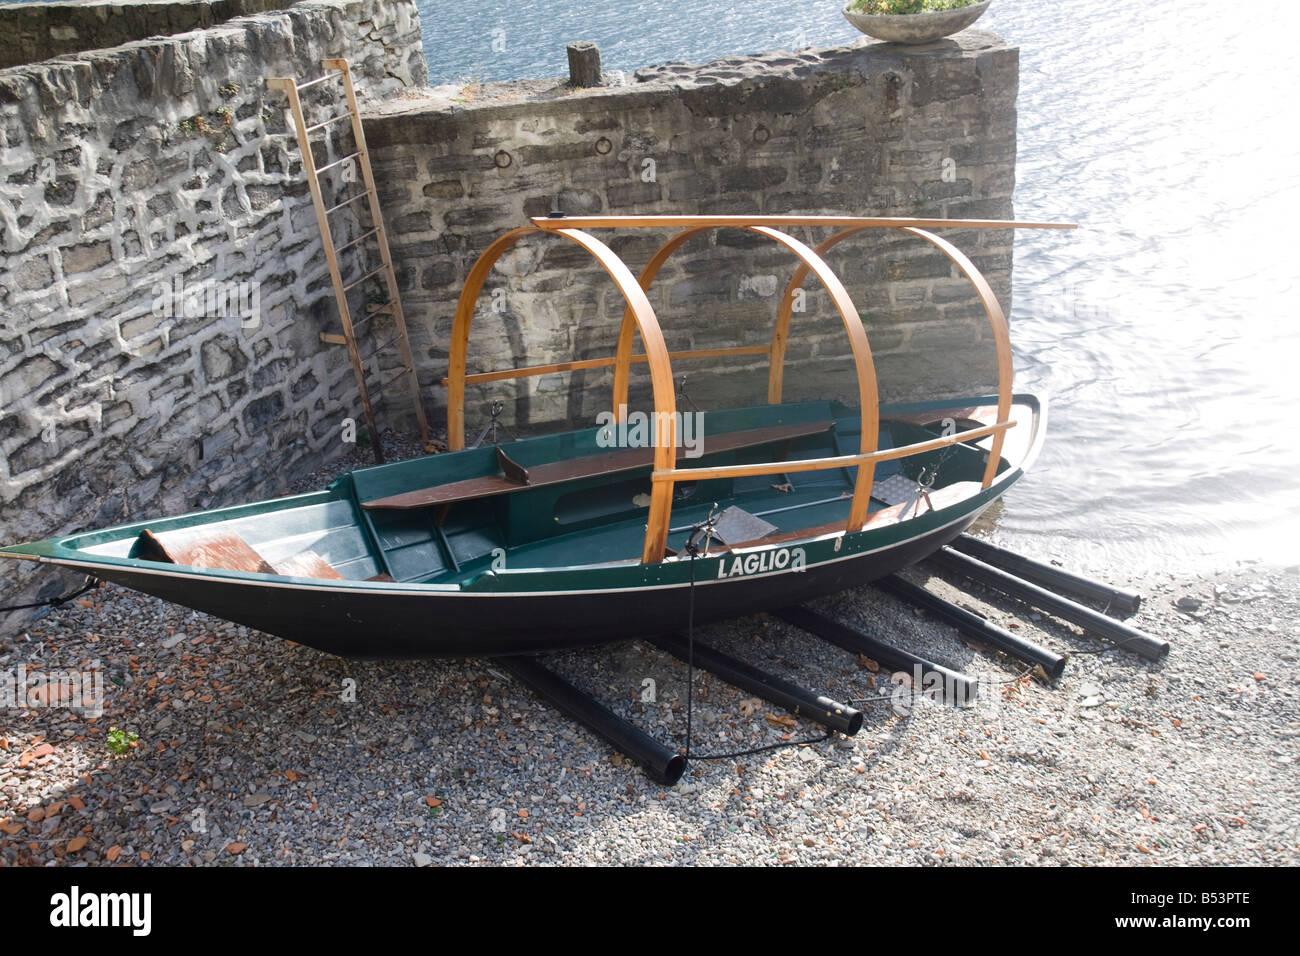 Traditional old lake Como boat in Laglio, Como, Italy - Stock Image